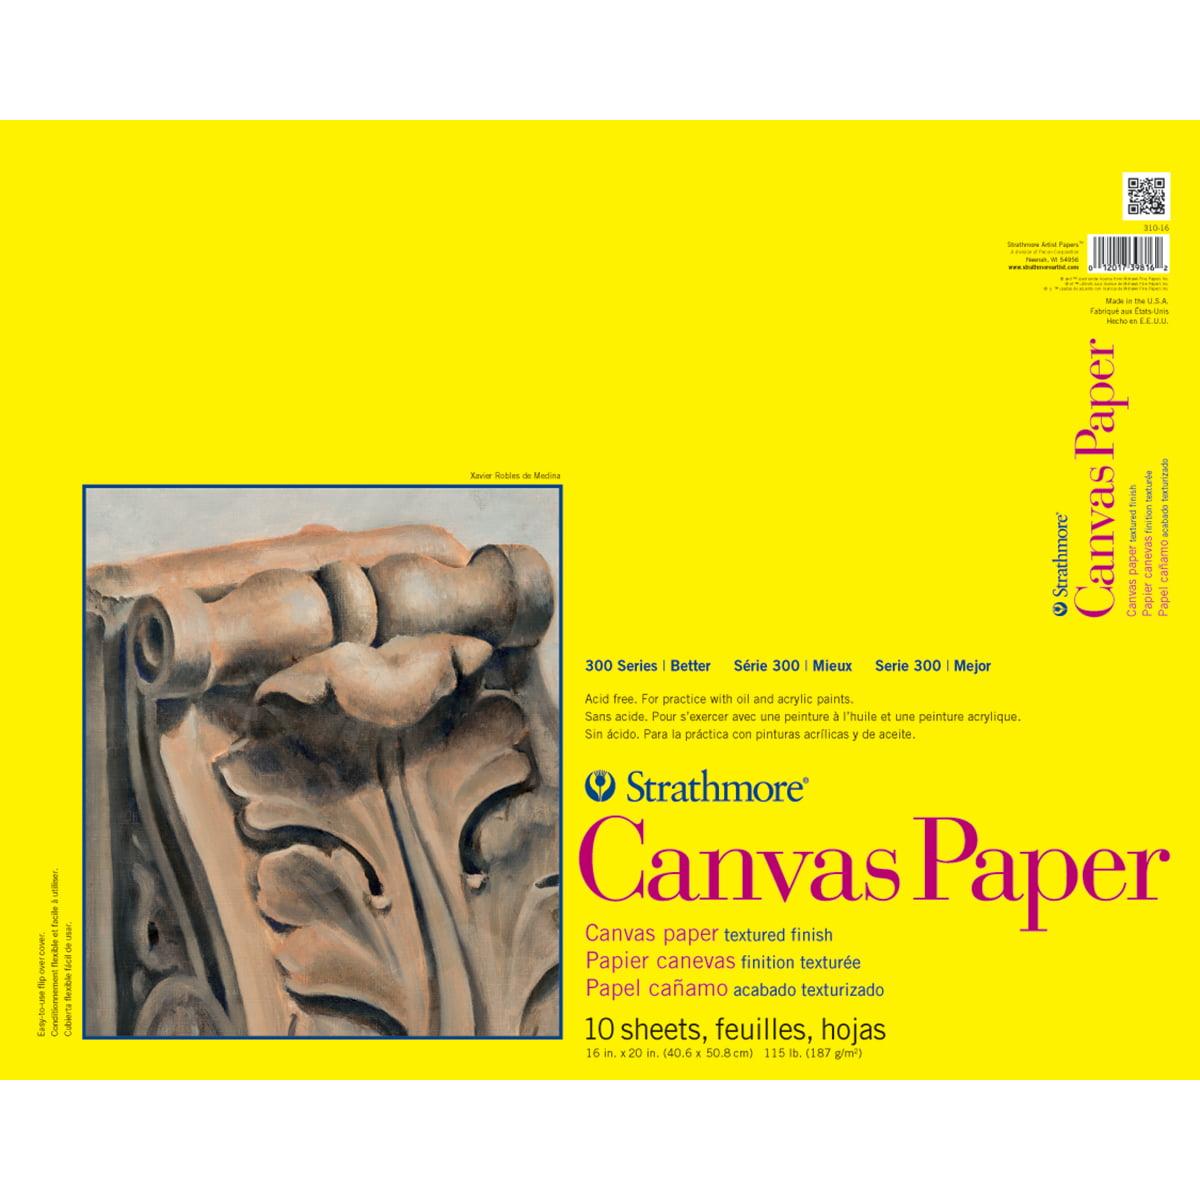 "Strathmore 16"" x 20"" Glue Bound Canvas Paper Pad"